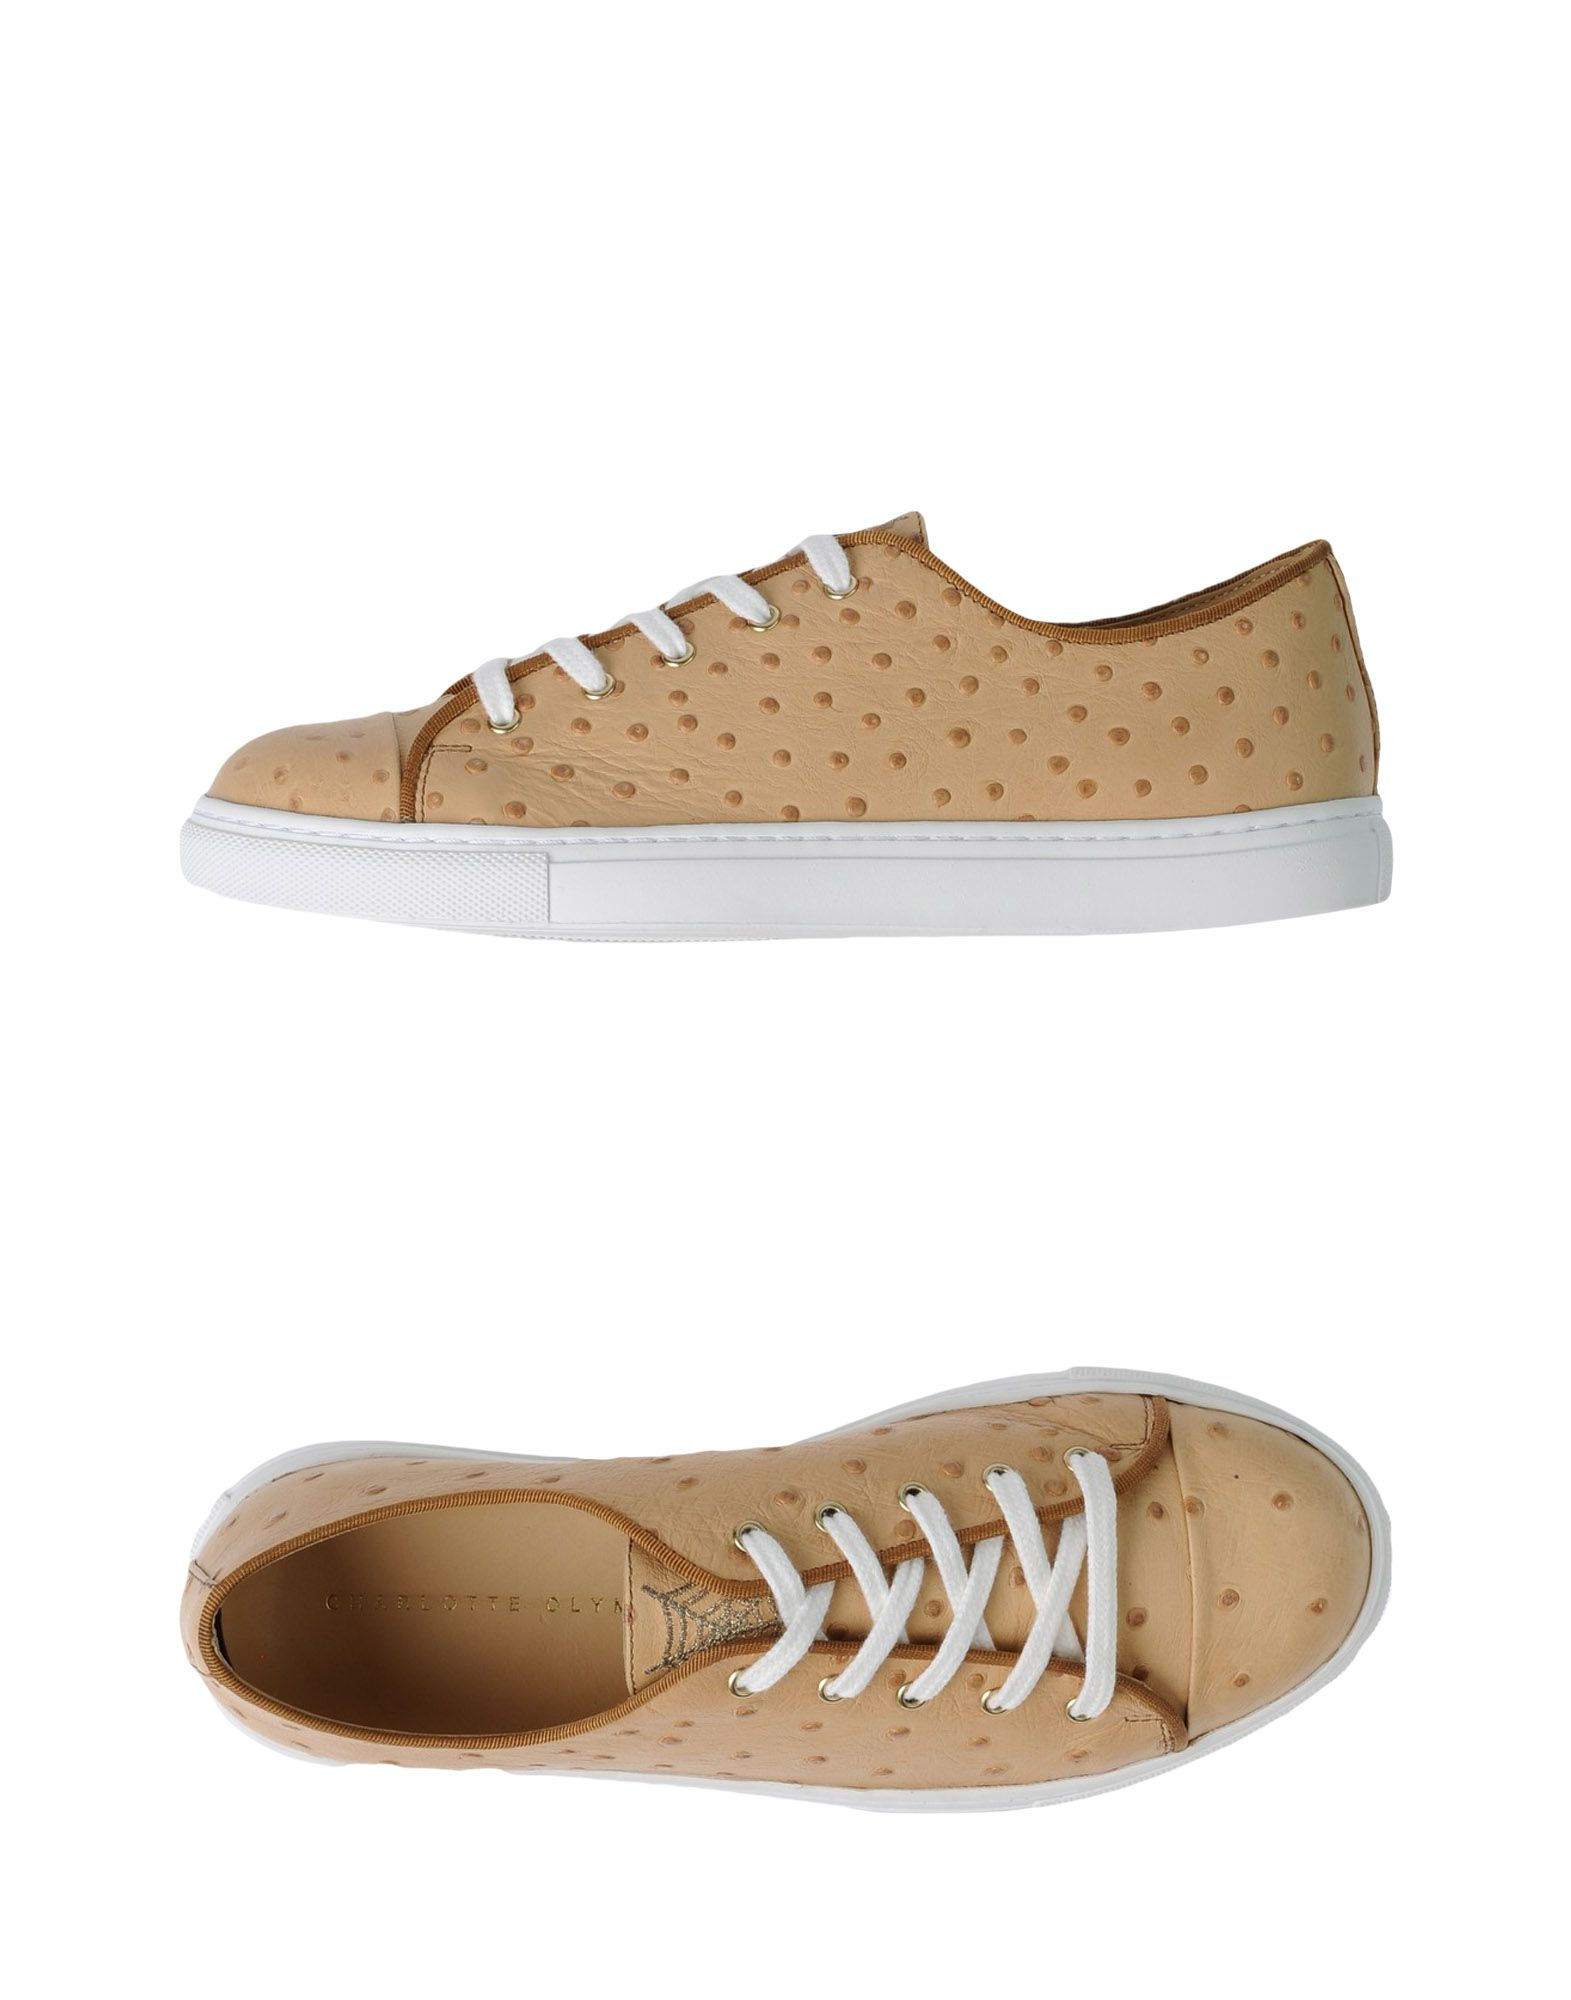 Charlotte Olympia Sneakers Damen  11338927MJGut aussehende aussehende aussehende strapazierfähige Schuhe 100abe